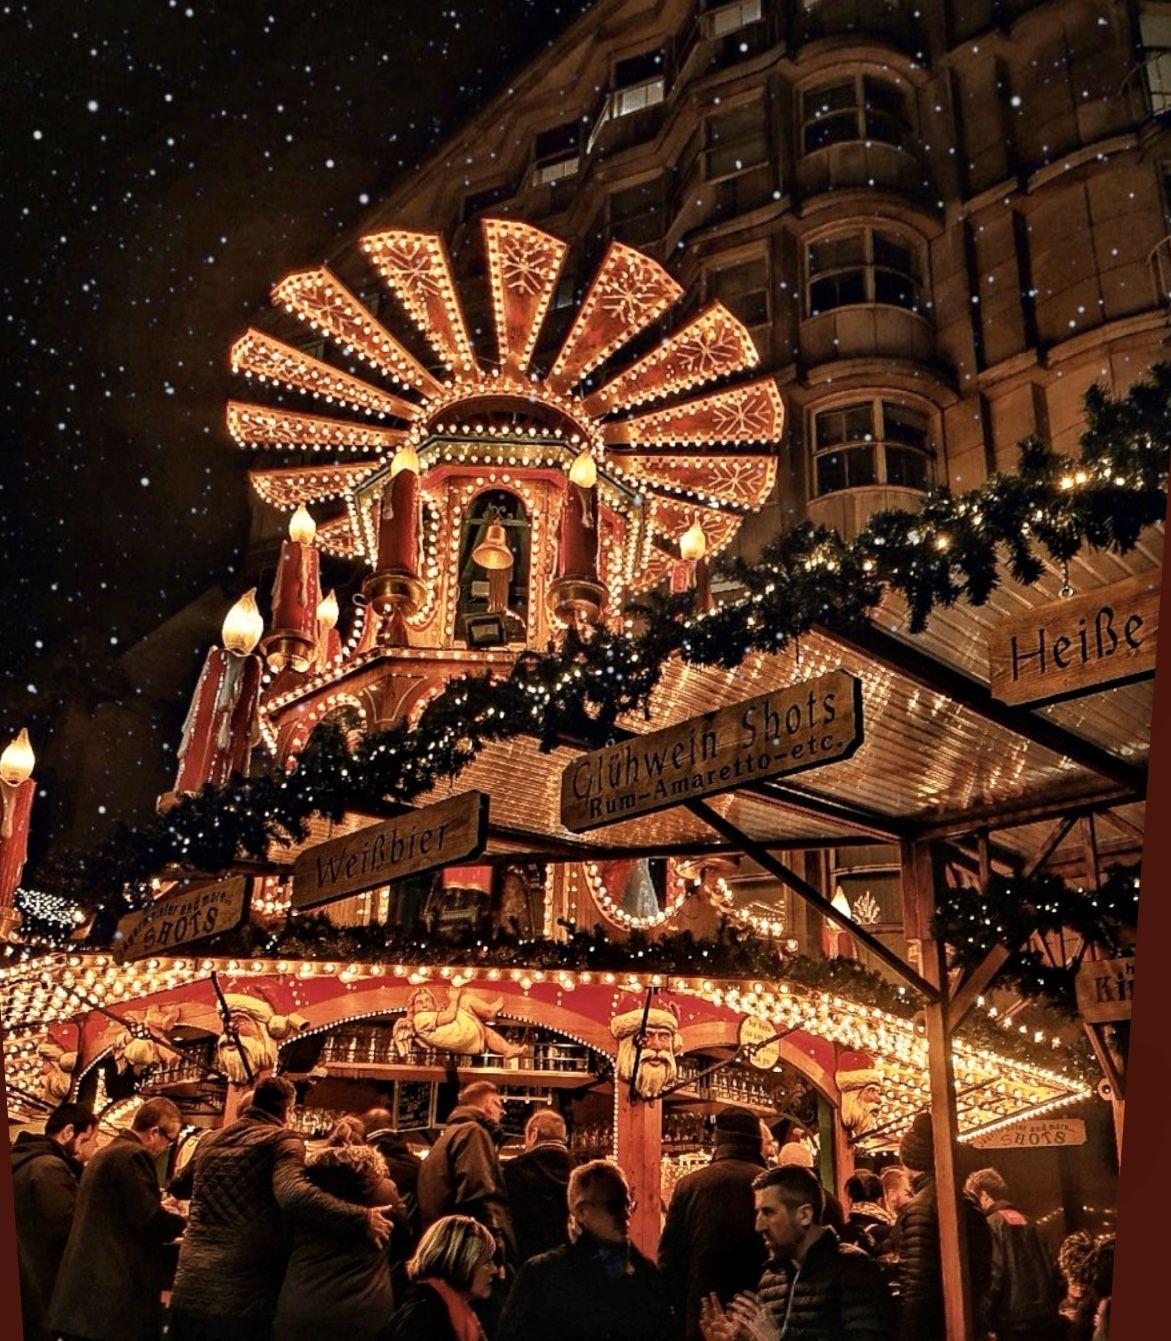 The German Christmas market 2019. BIRMINGHAM in 2020